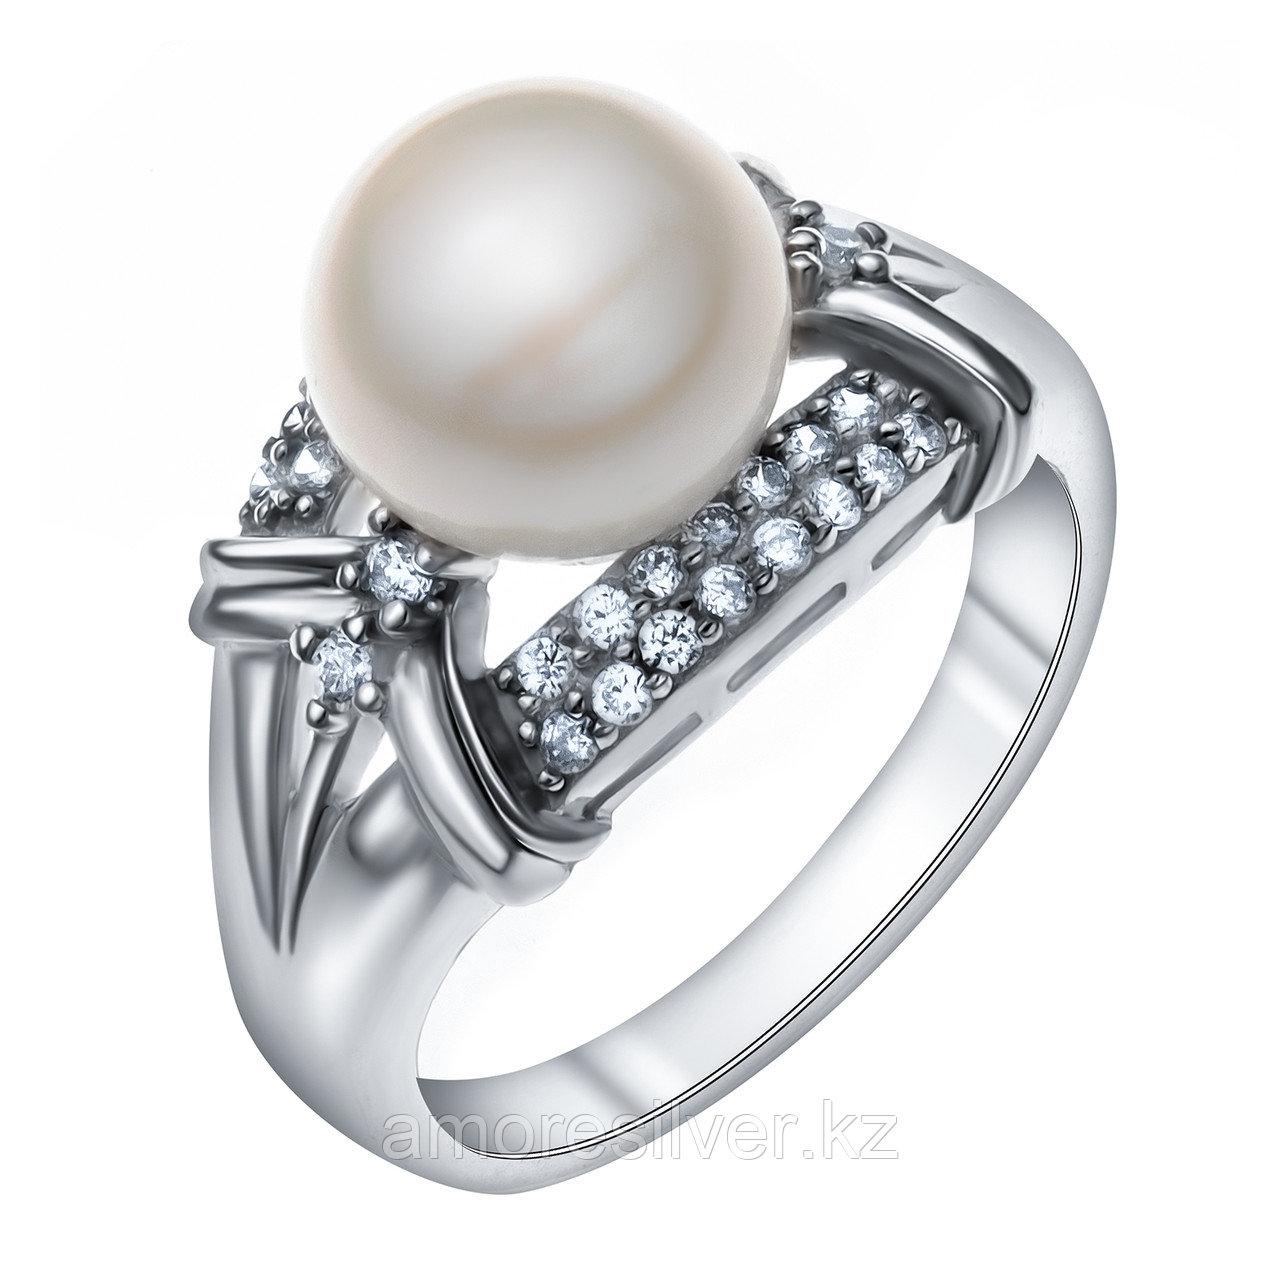 Кольцо TEOSA серебро с родием, жемчуг культ. фианит, капля SR2144-W